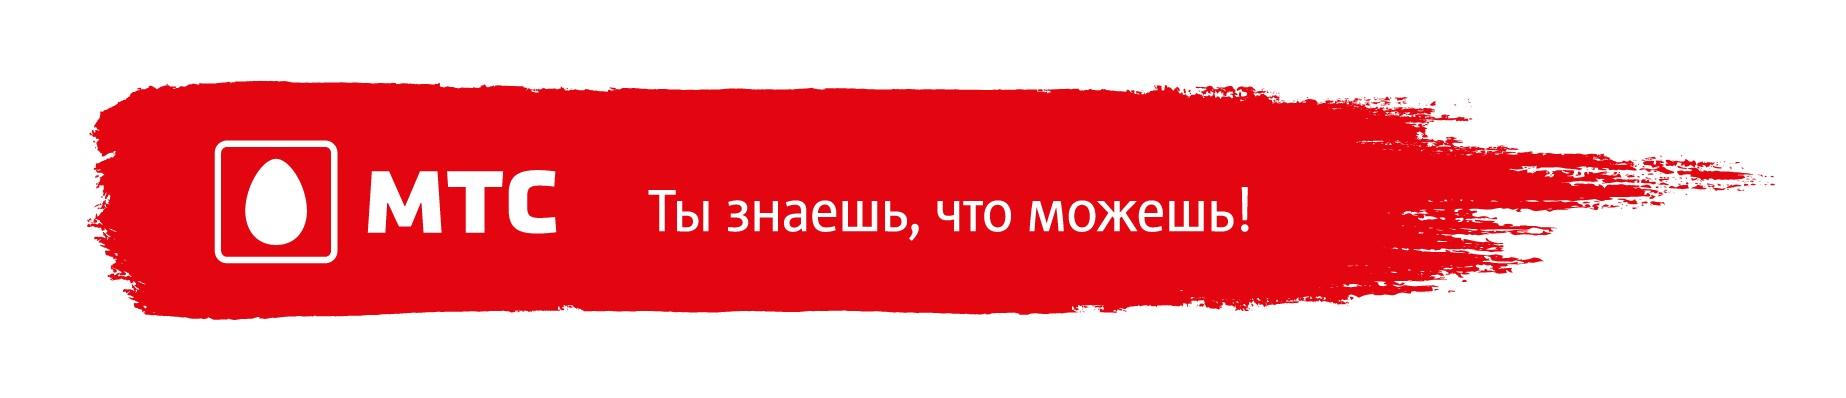 Скачать Яндекс.Браузер - Yandex browser